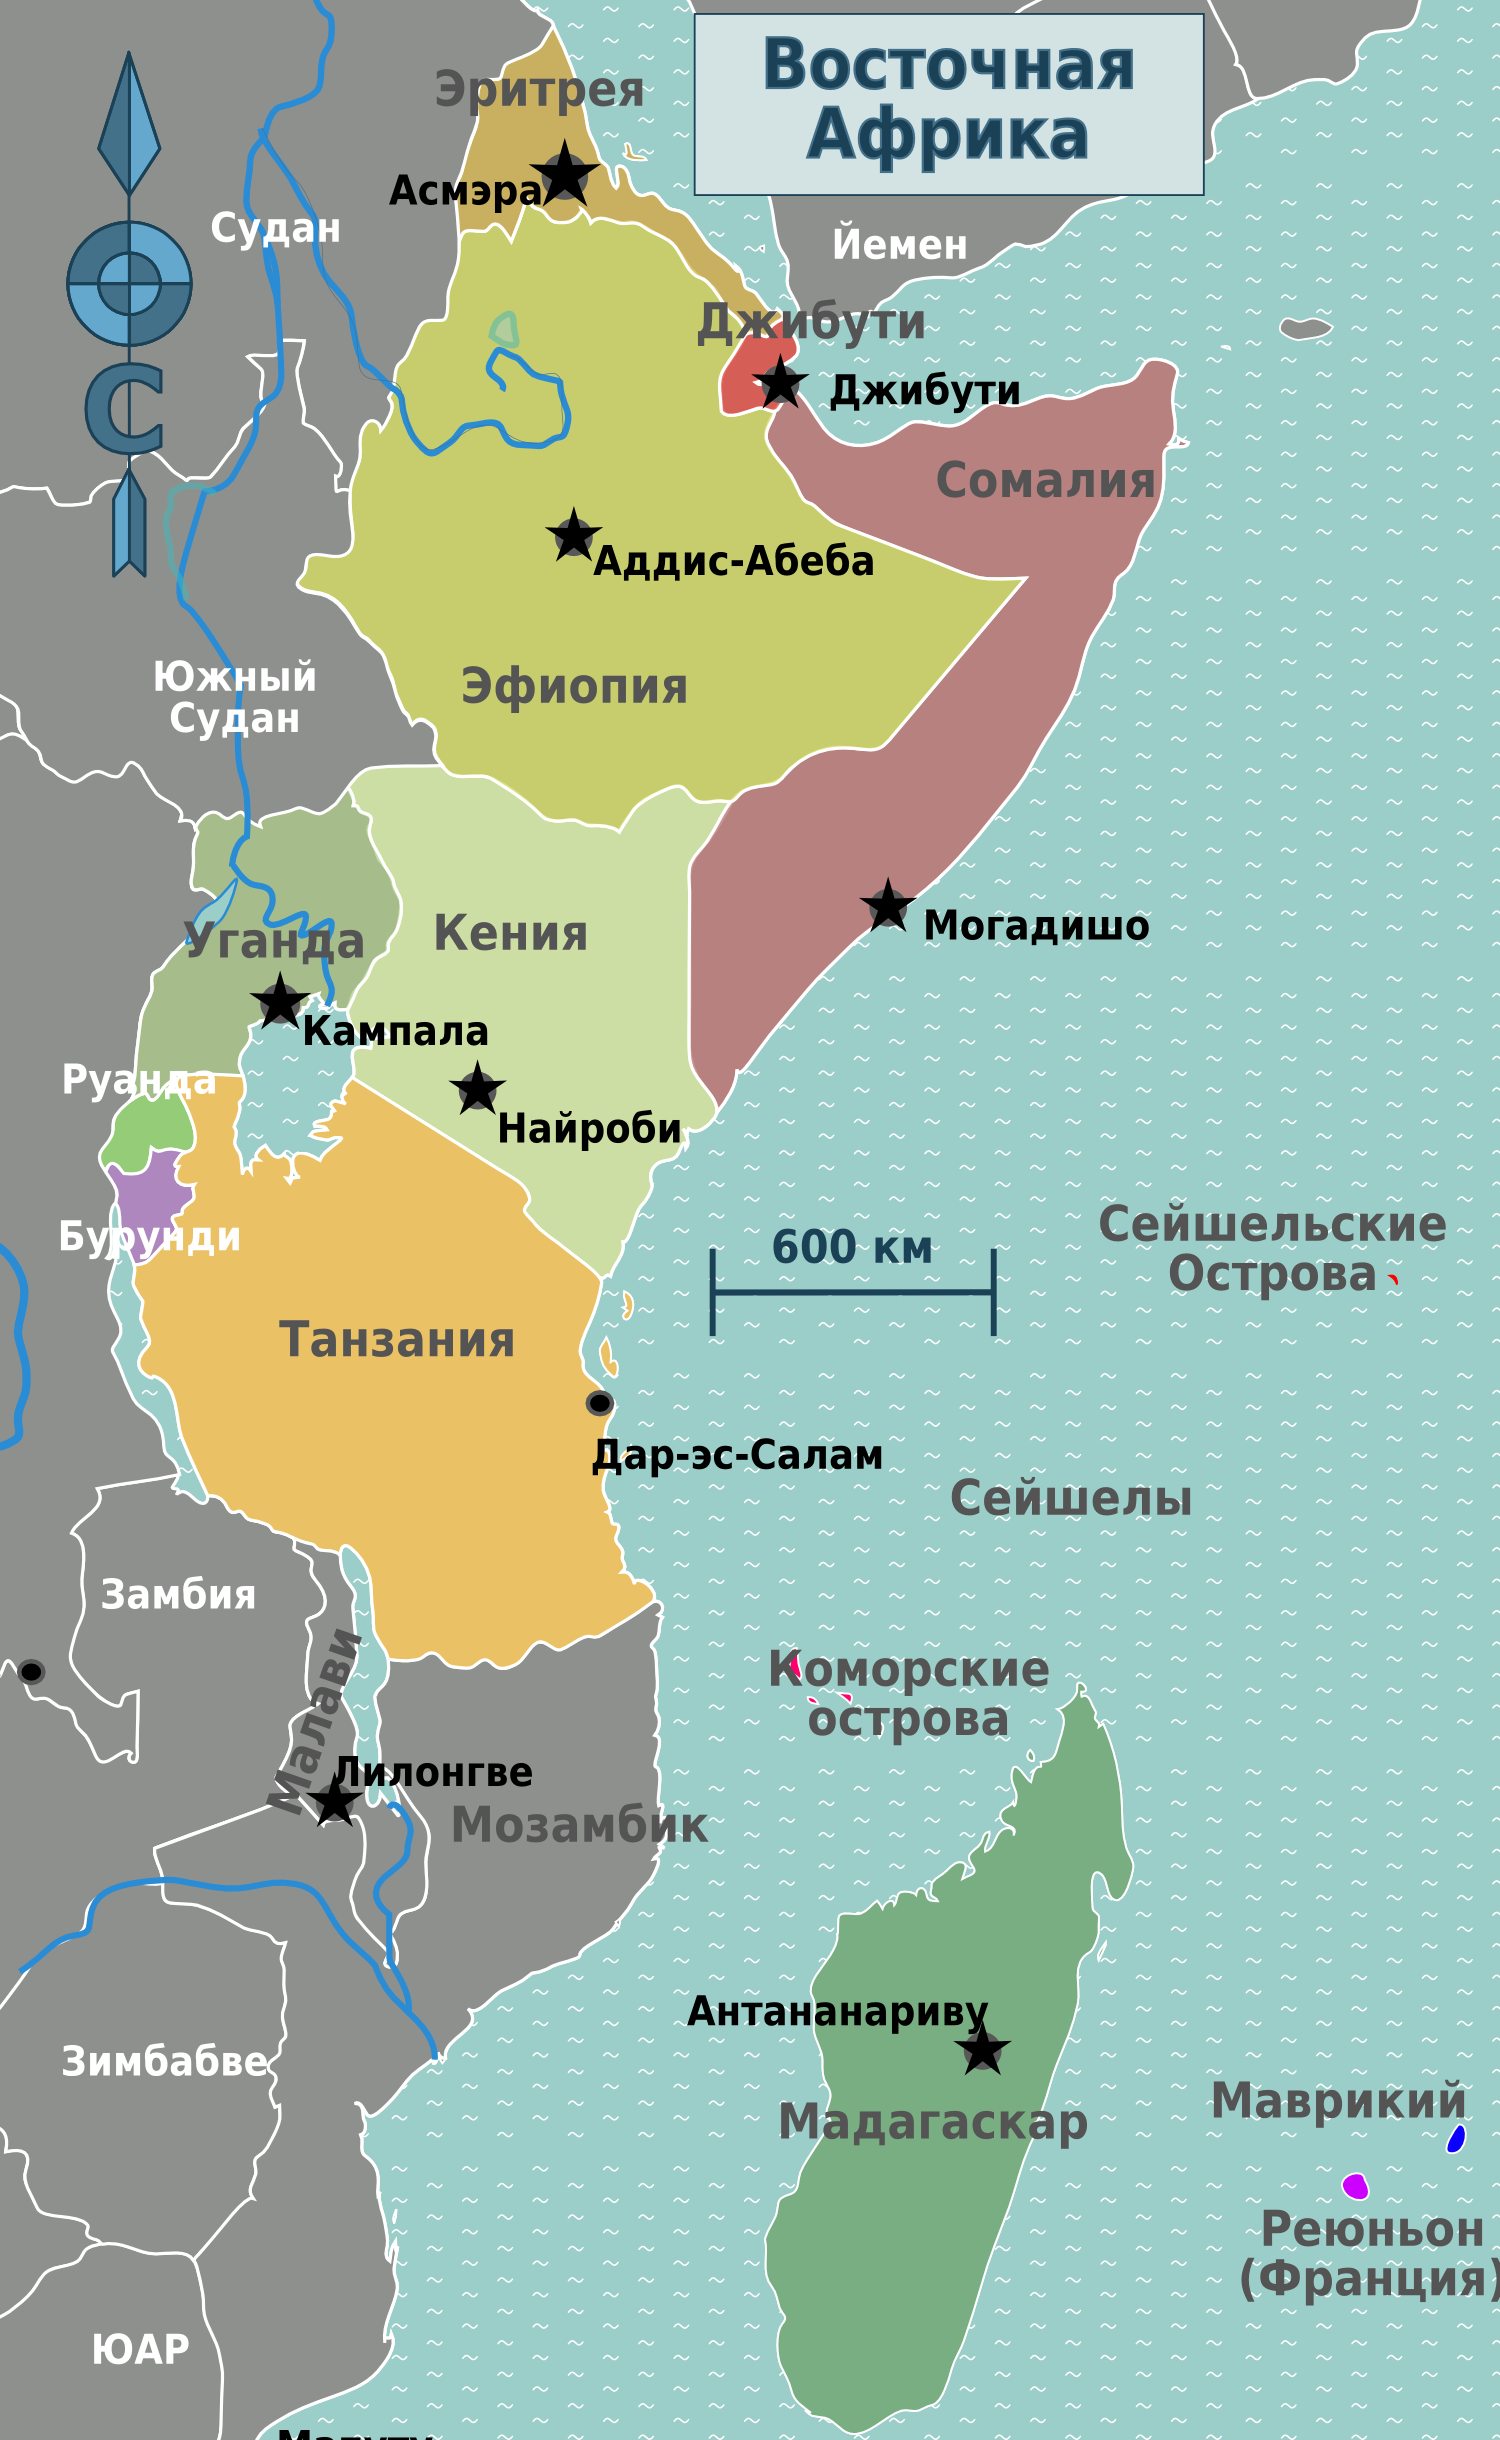 File:East Africa regions map (ru).png - Wikimedia Commons